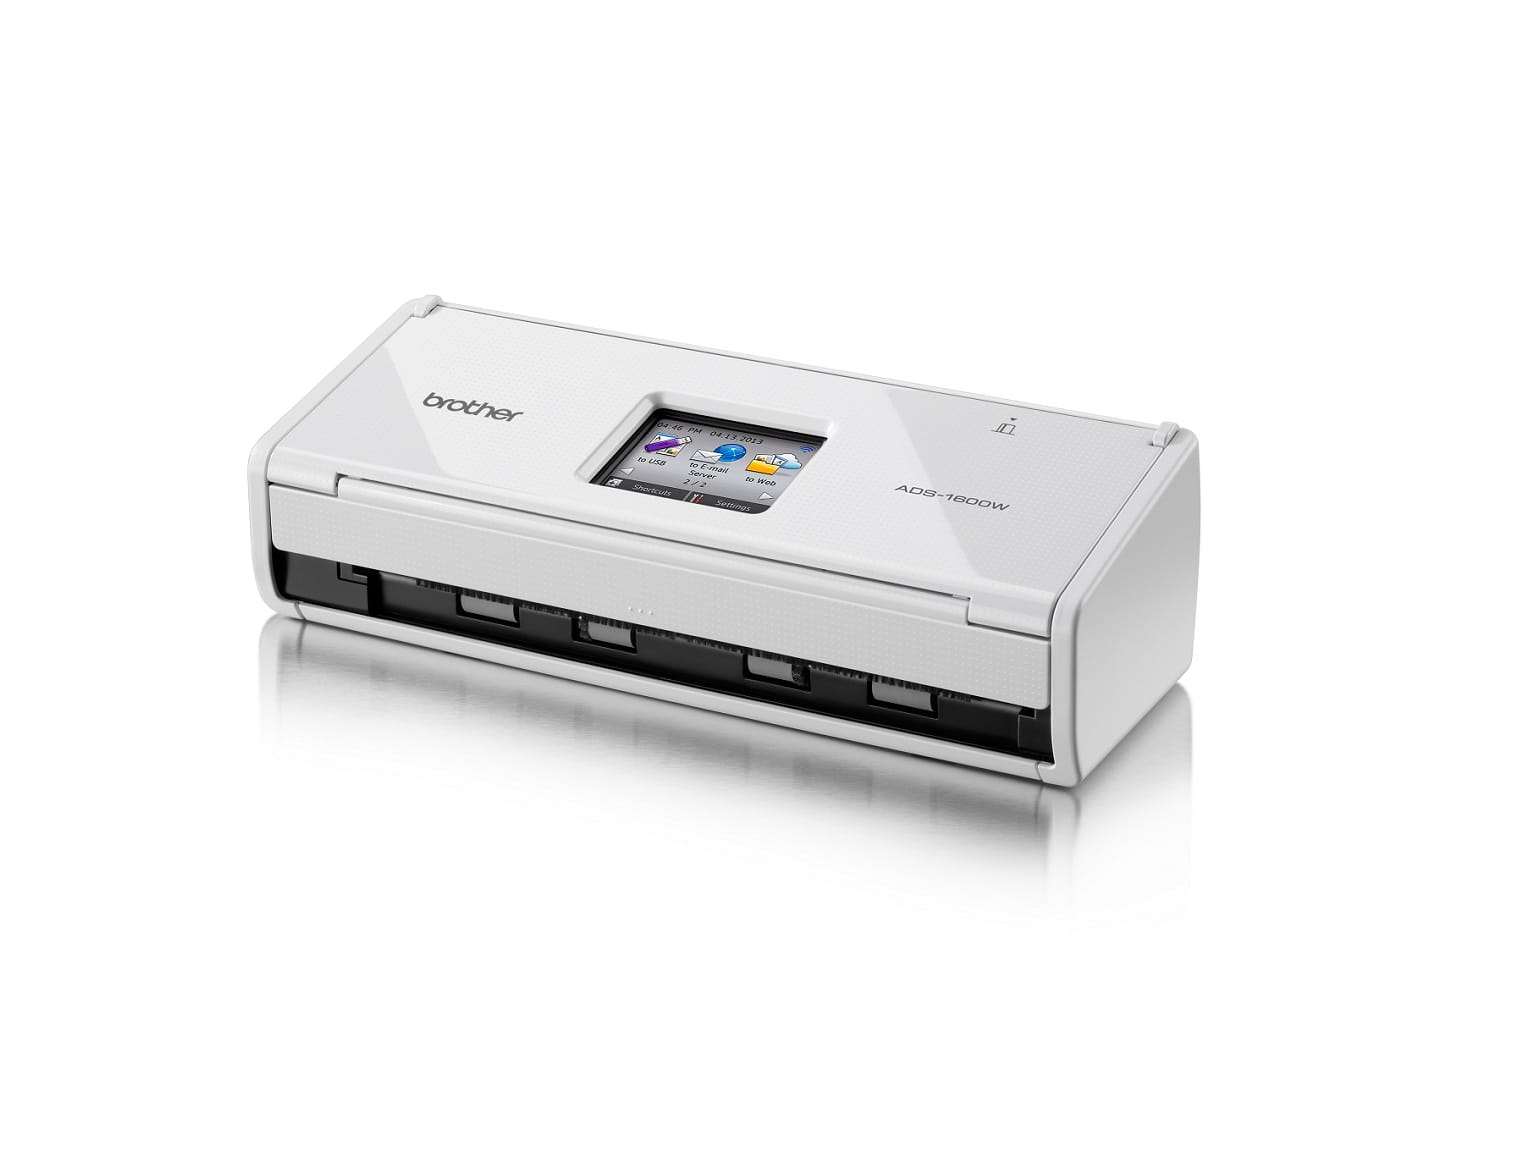 Scanner compatto Brother ADS-1600W con WiFi